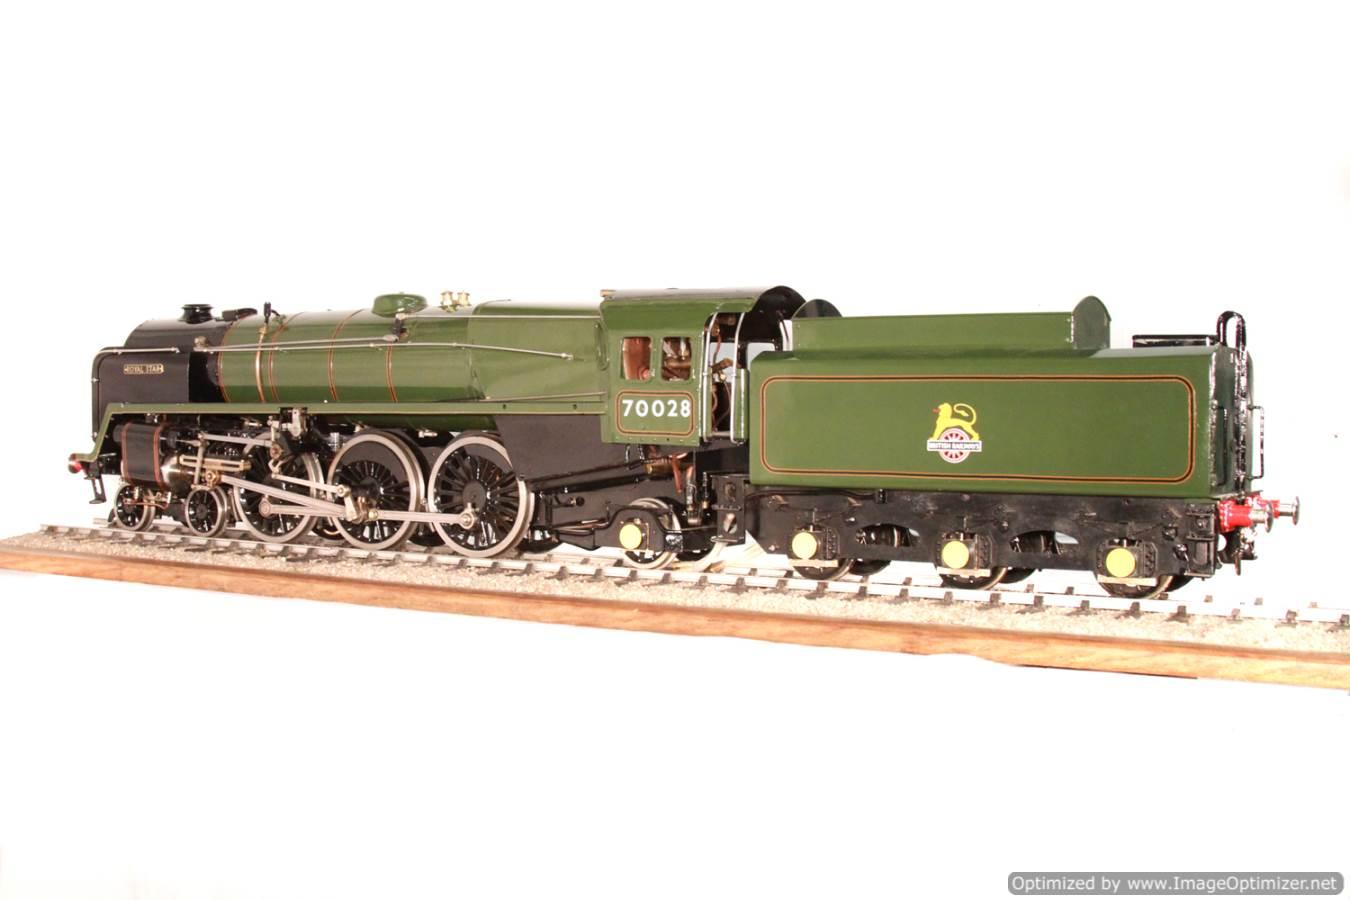 test BR Britannia live steam locomotive for sale 30 Optimized